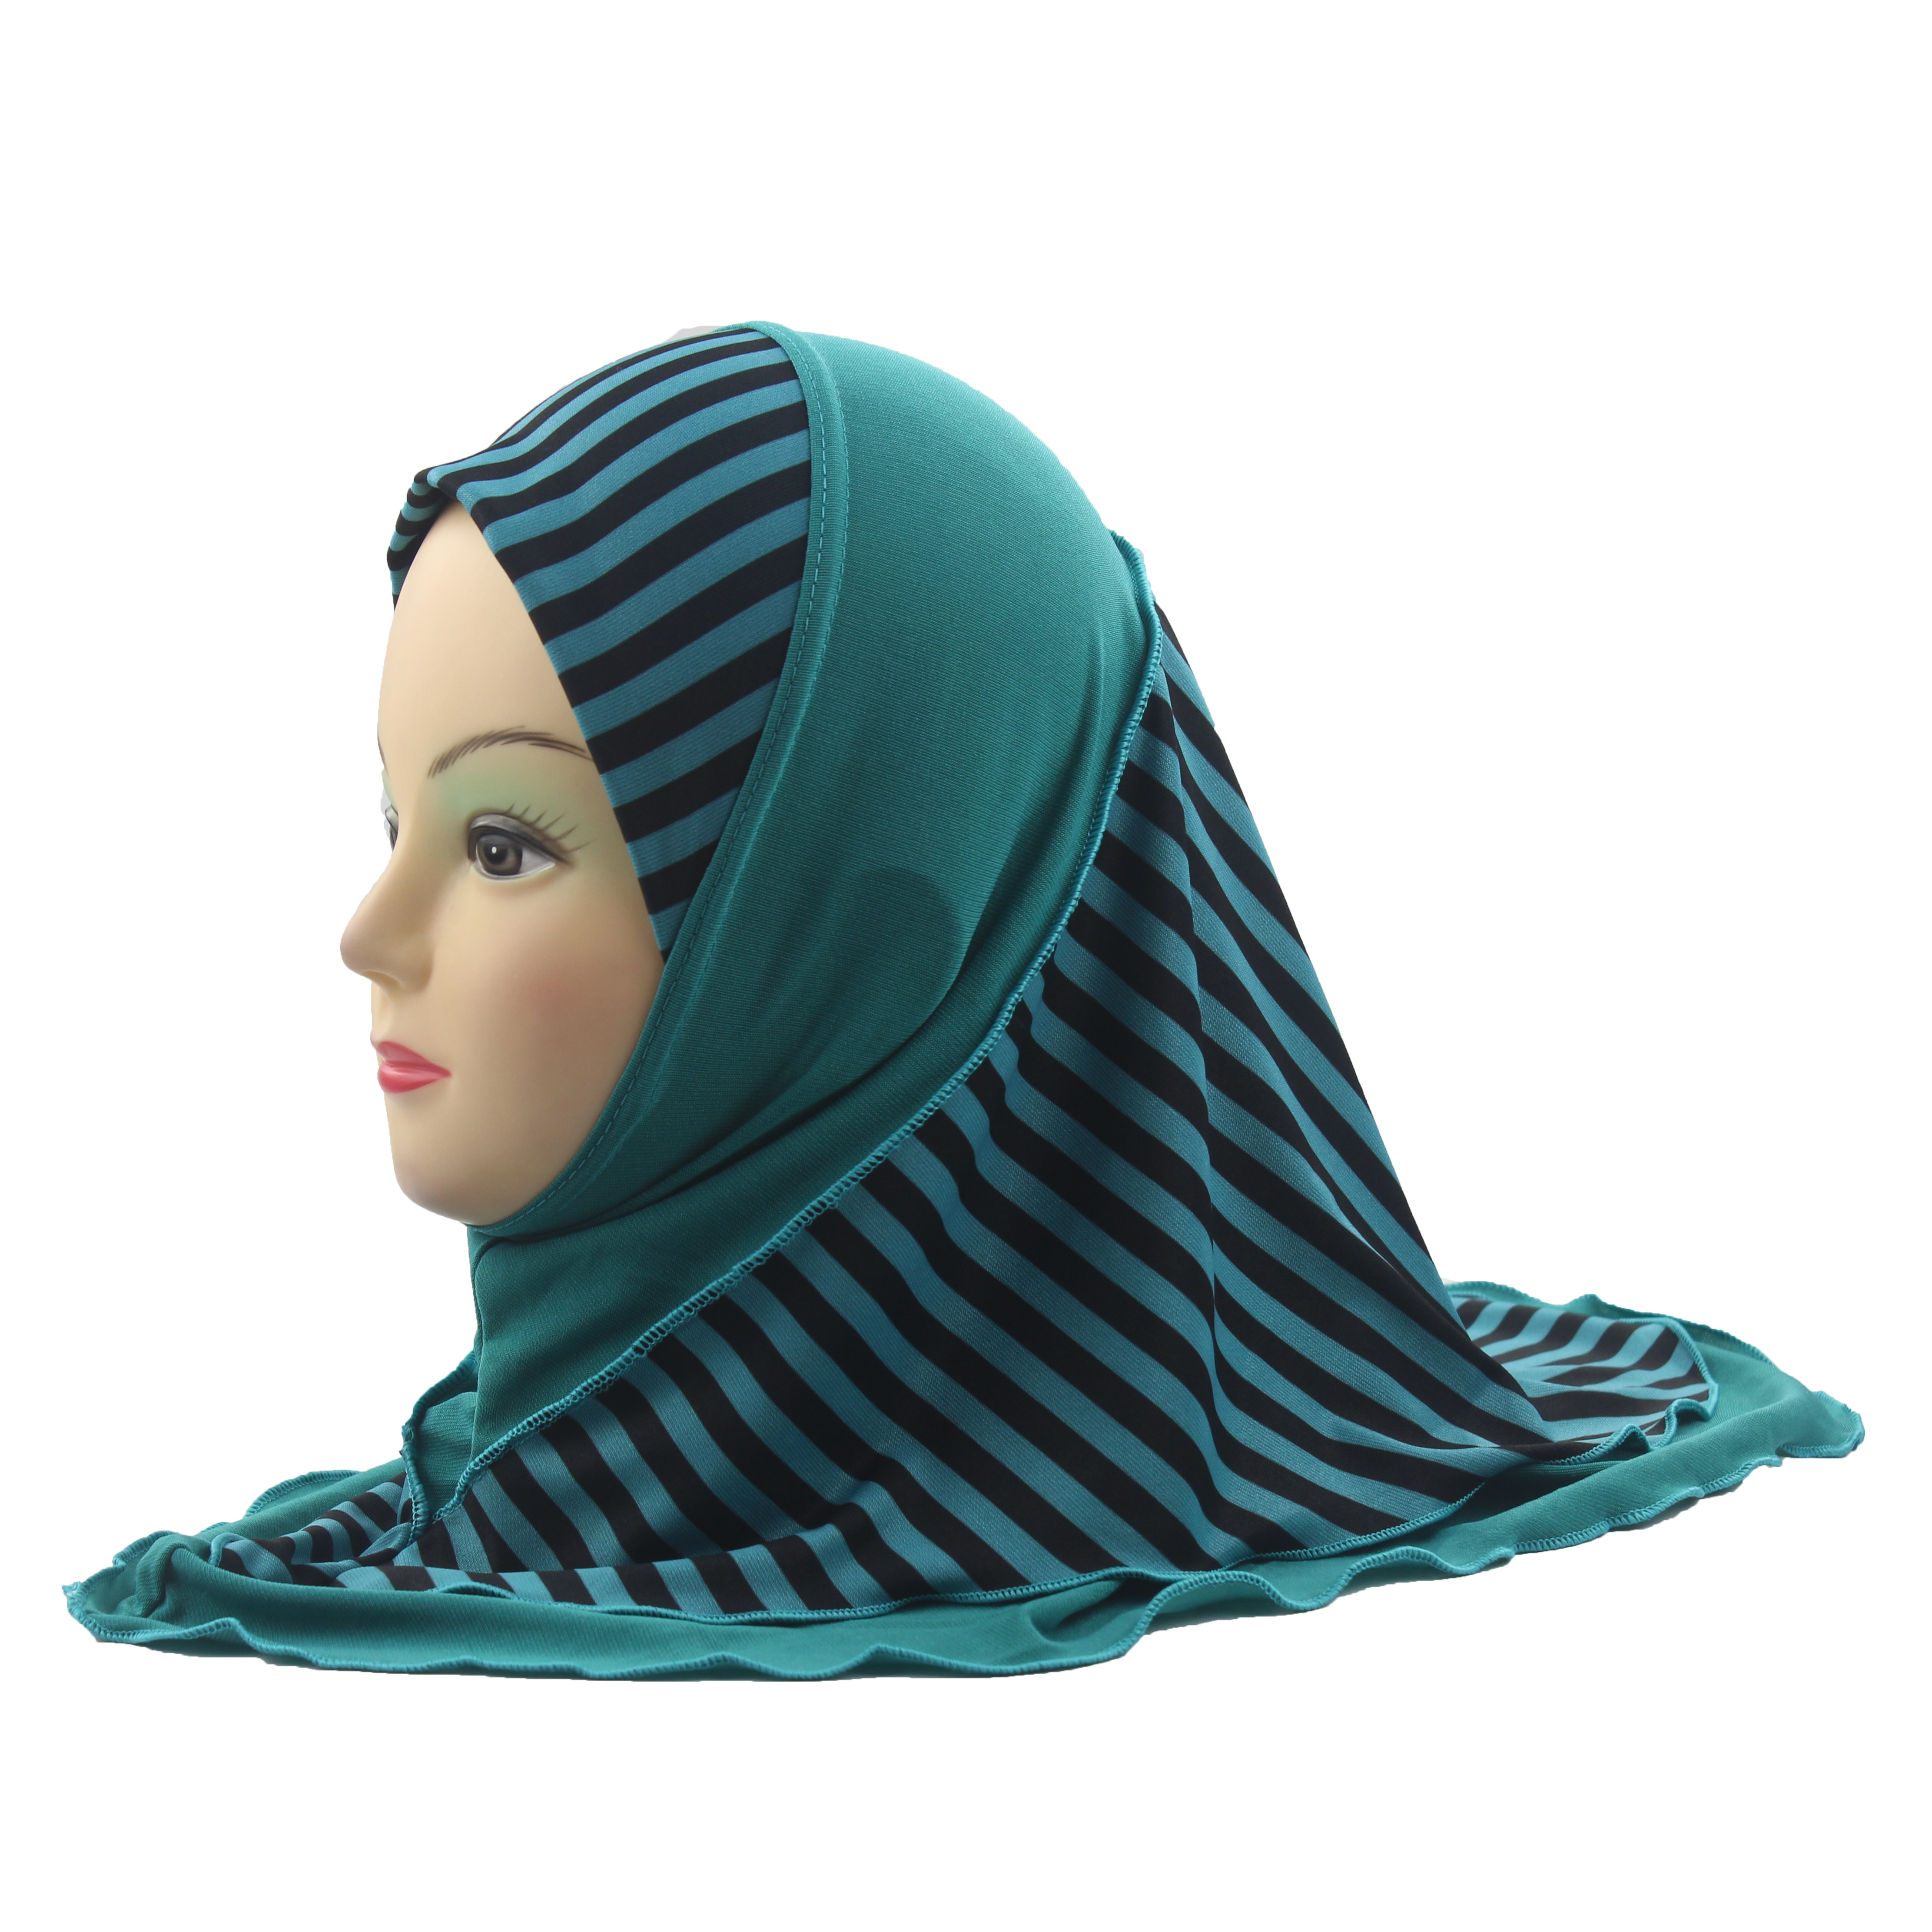 Muslim Girls Kids Hijab Islamic Arab Scarf Shawls Stripe Pattern Double Layers for 3 to 7 years old Girls Wholesale